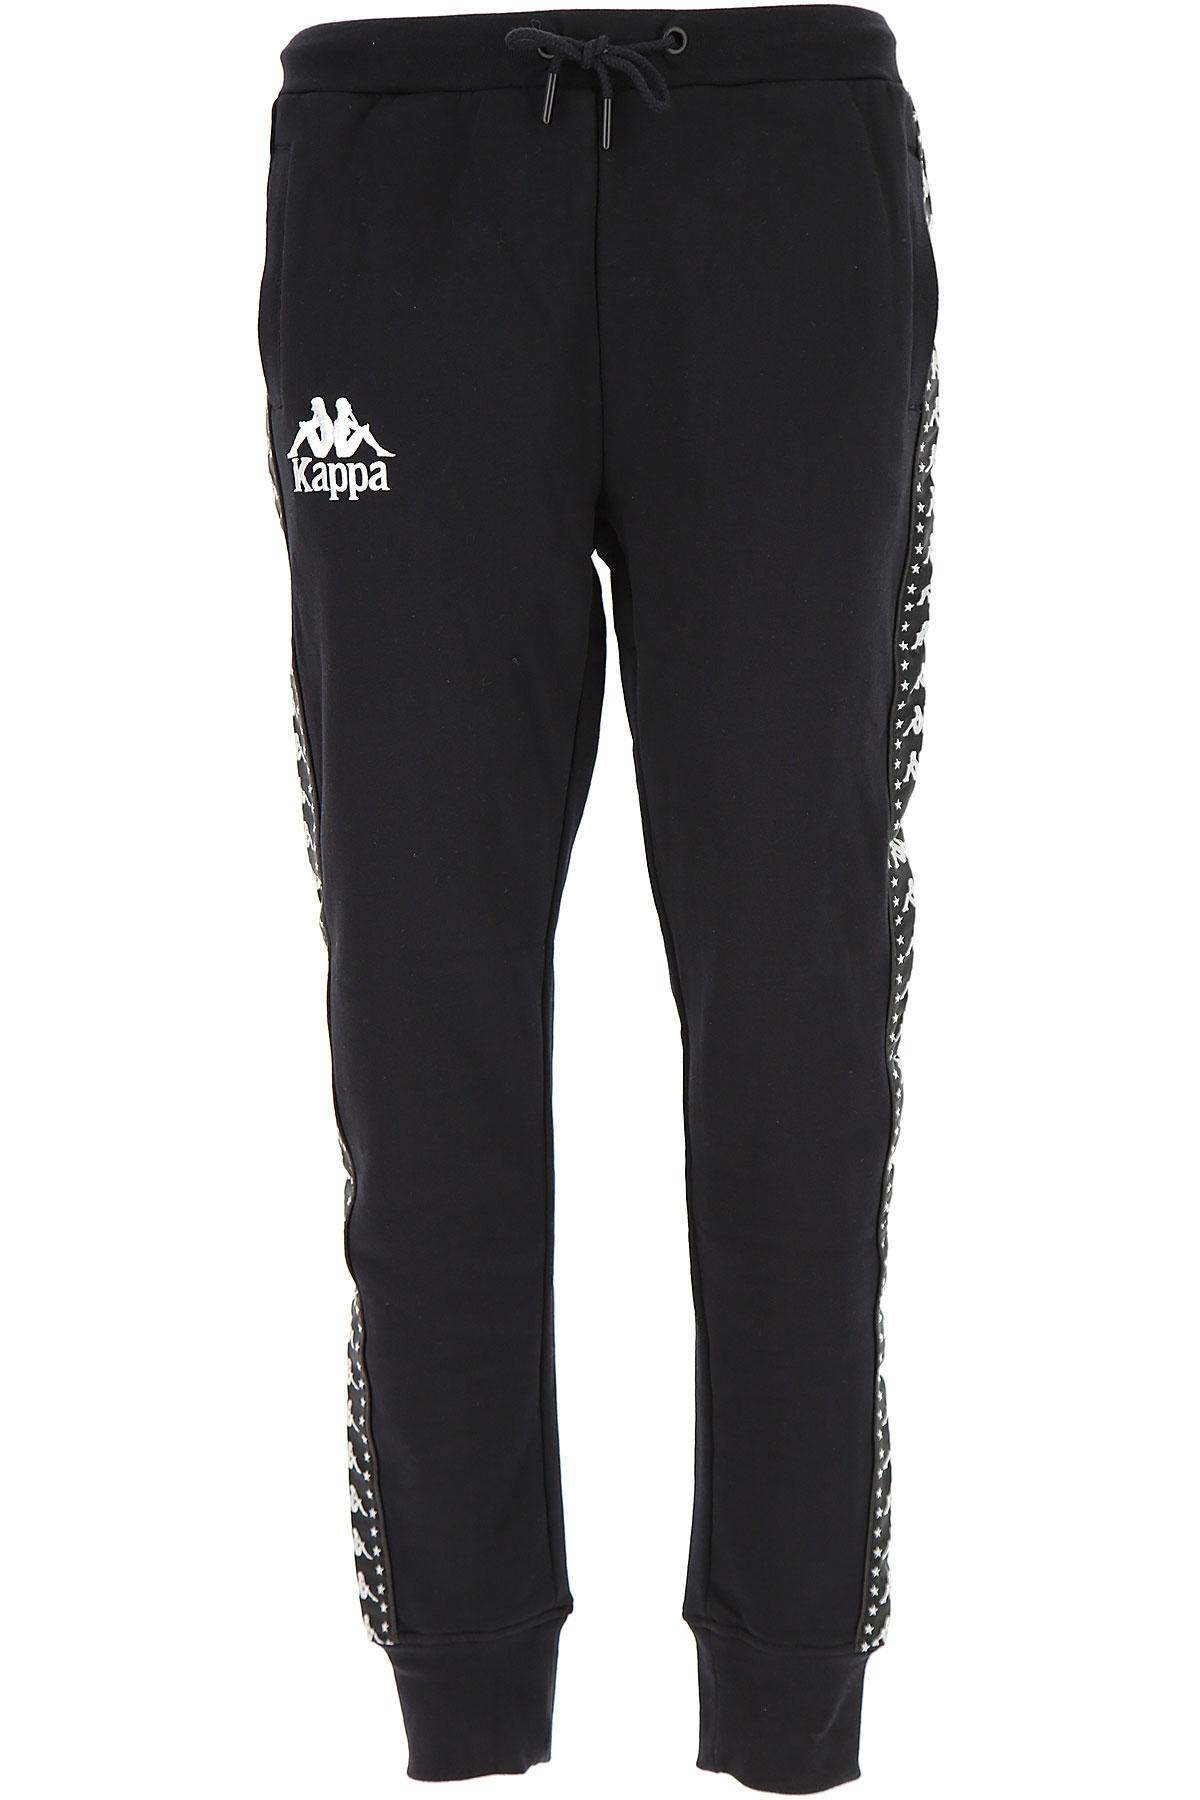 Image of Kappa Sweatpants, Black, Cotton, 2017, M XL